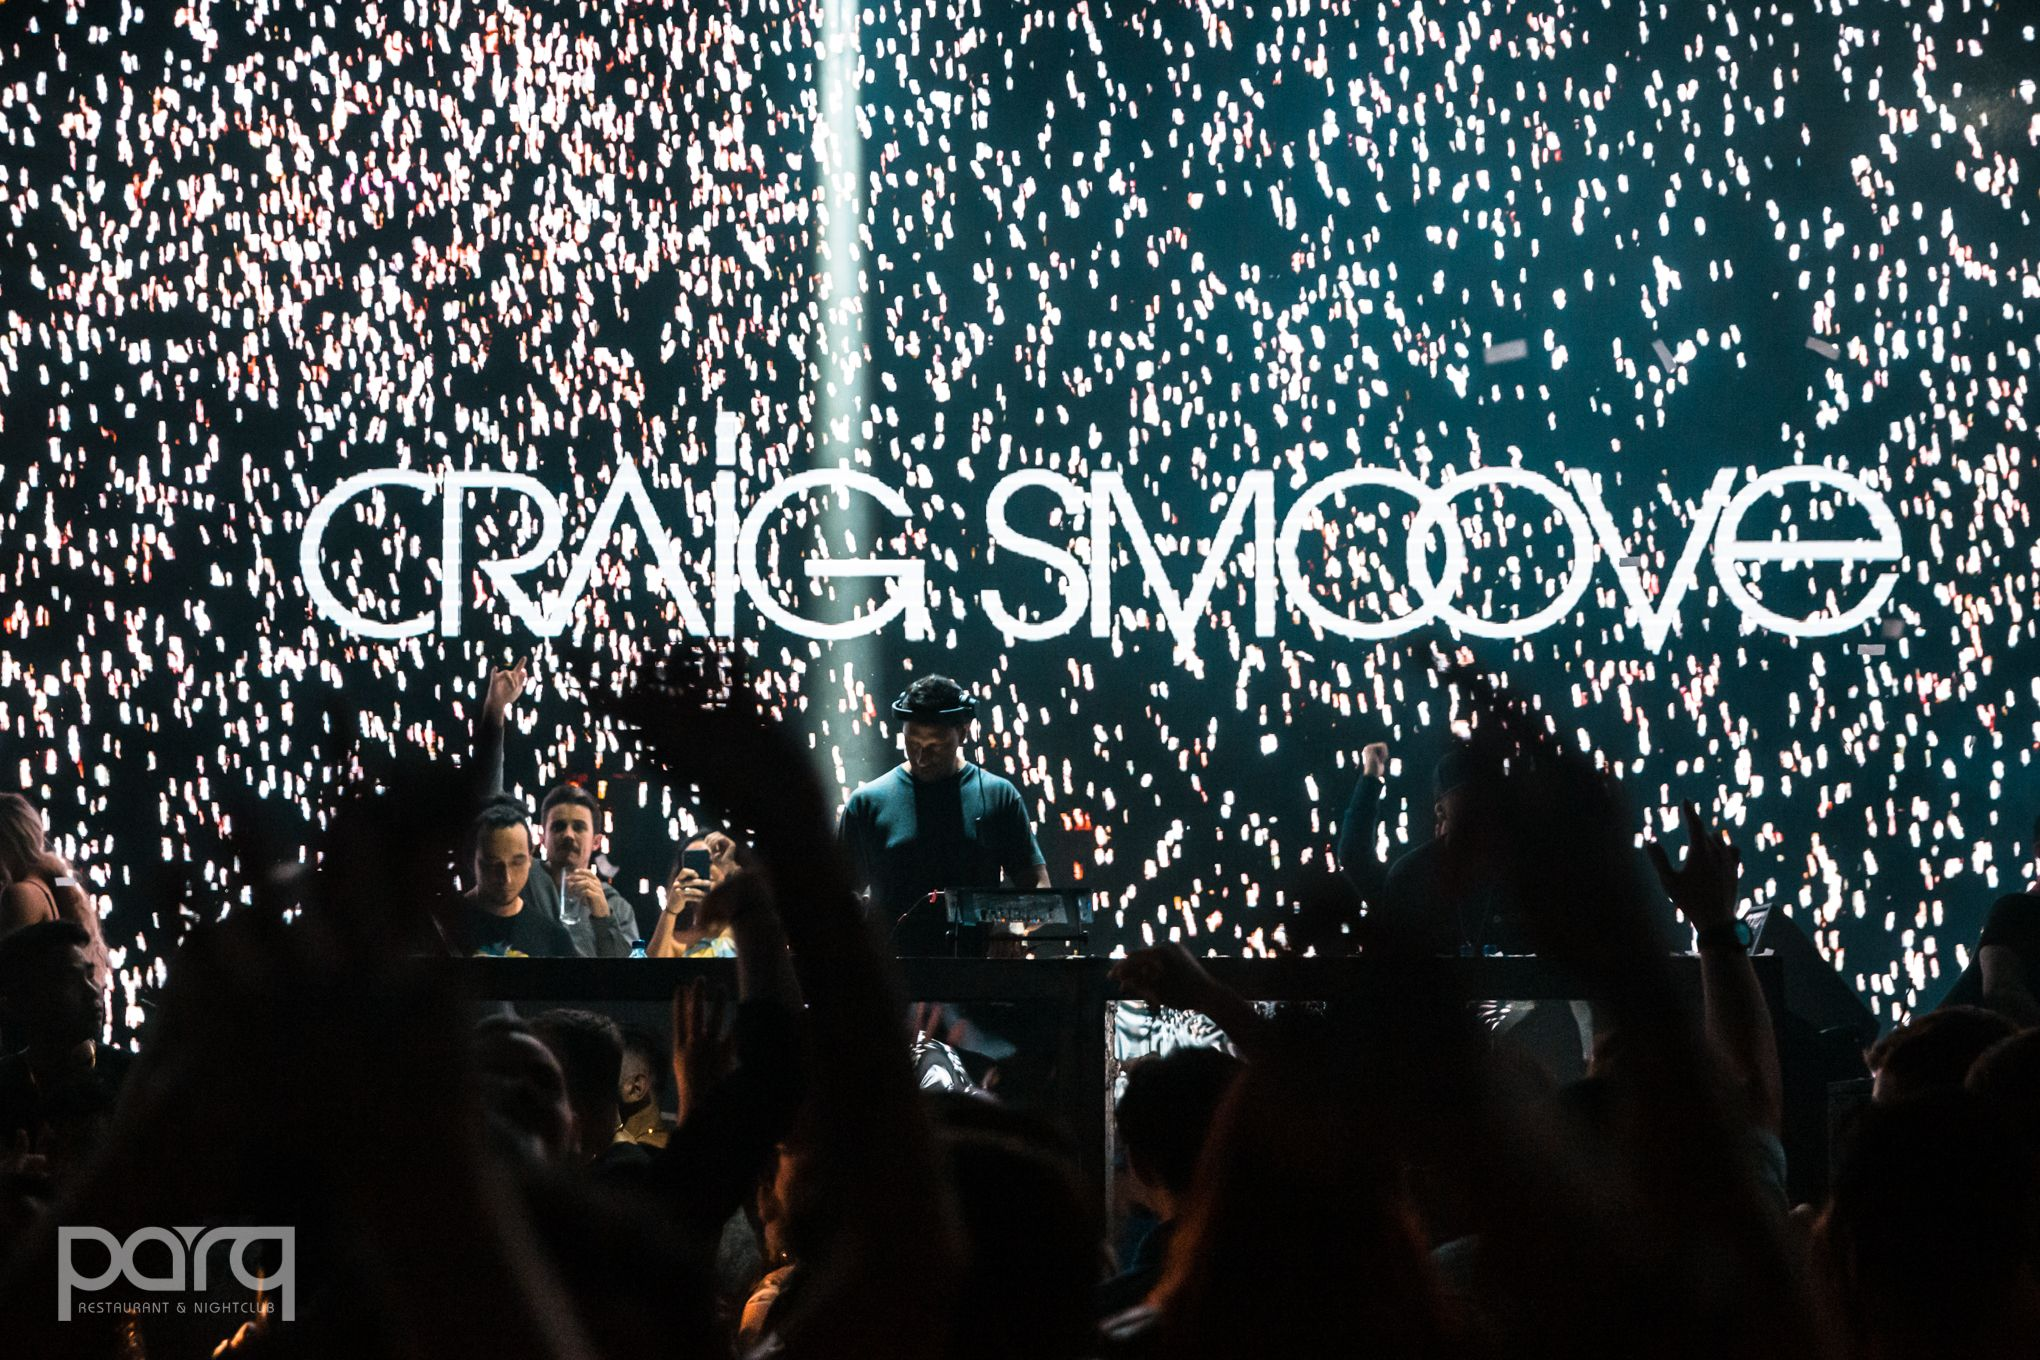 11.02.19 Parq - Craig Smoove-1.jpg